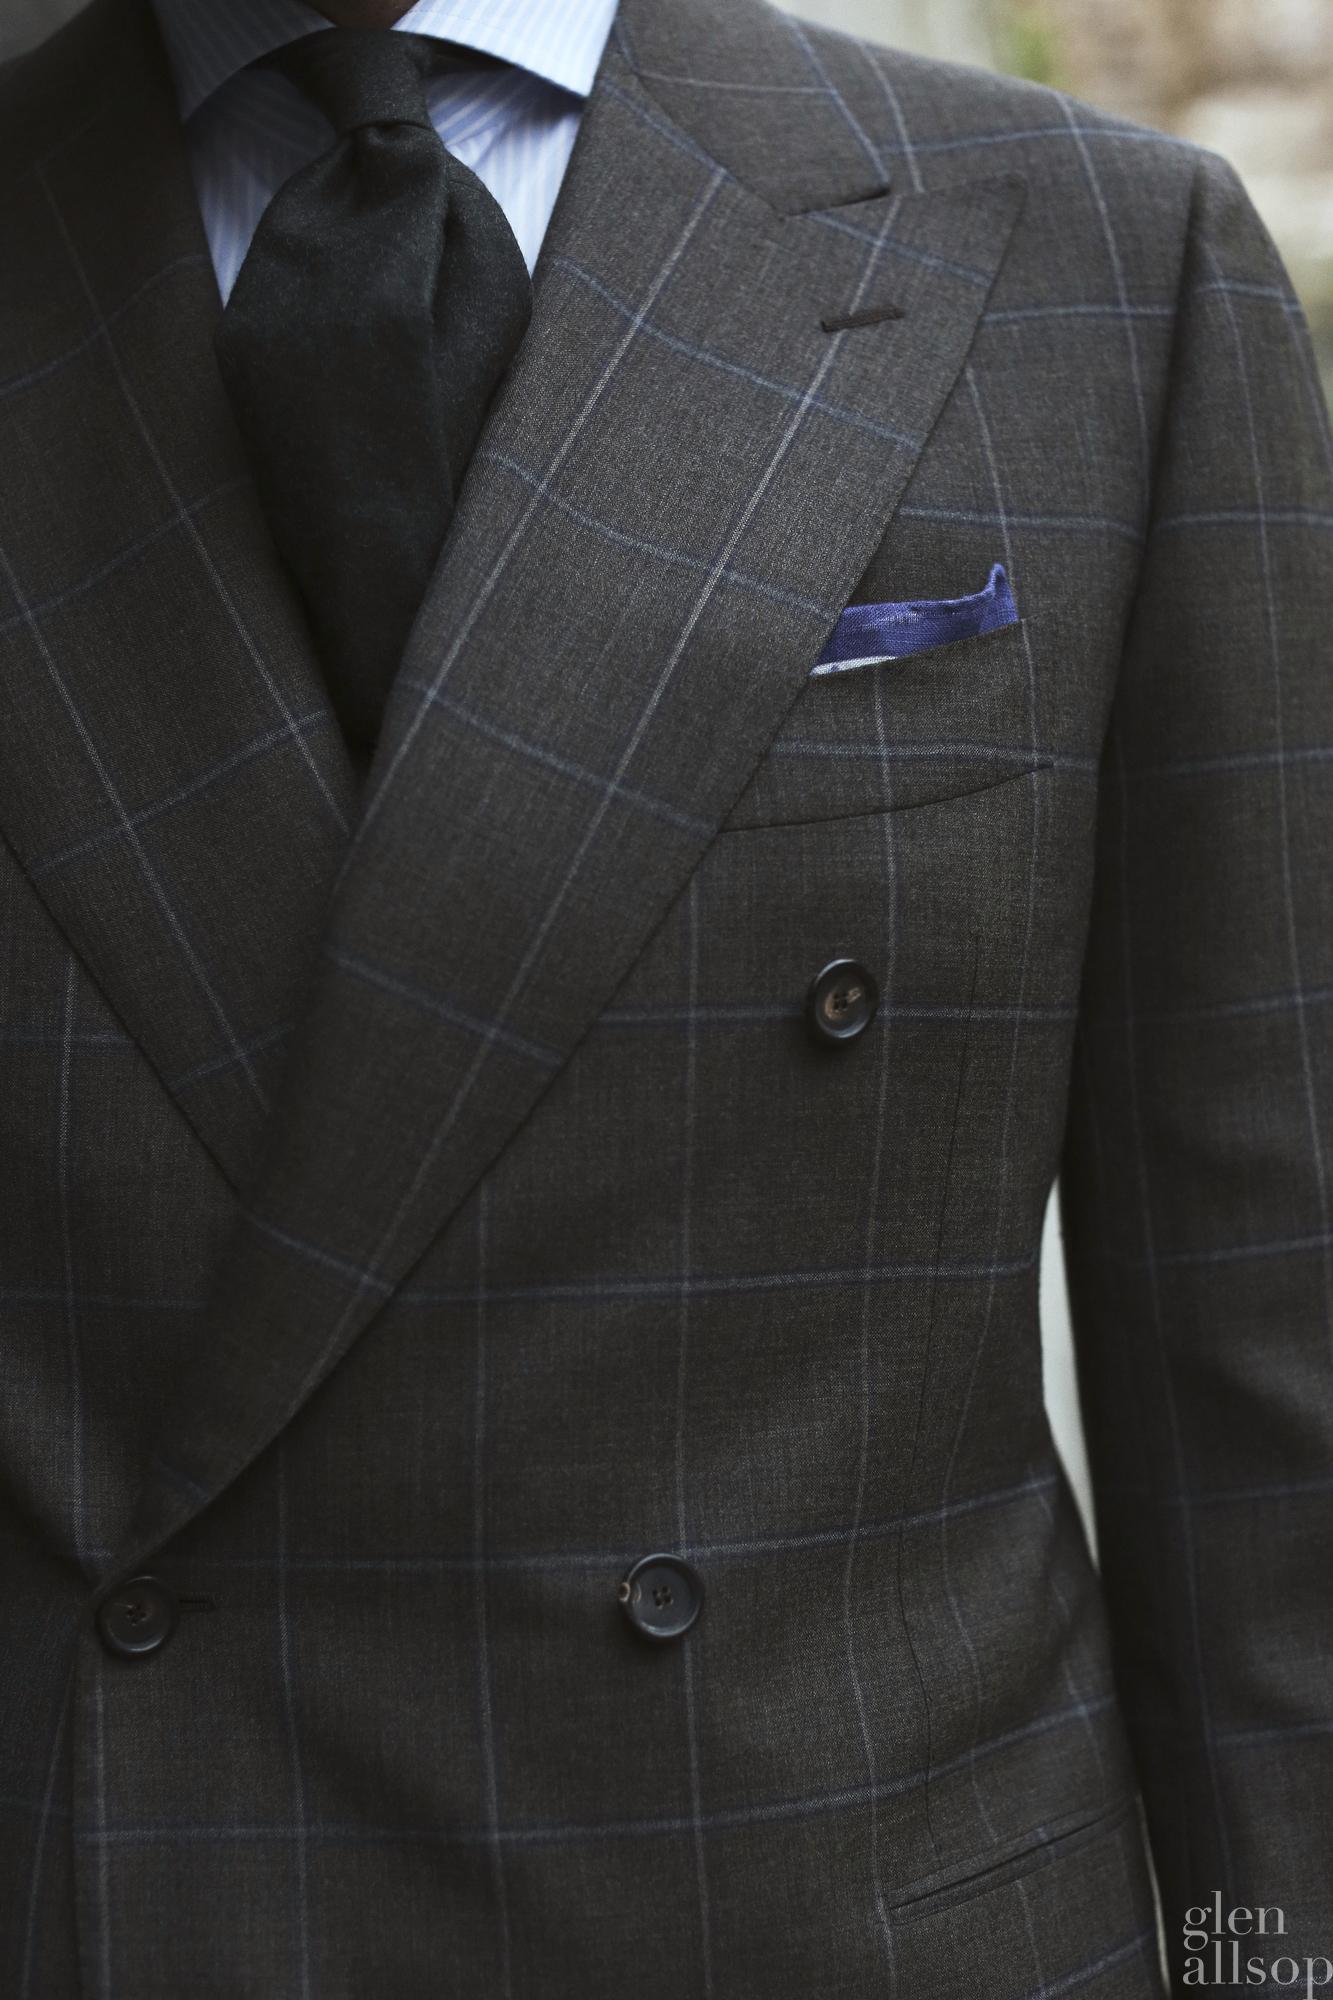 attolini-window pane-suit-menswear-glen allsop